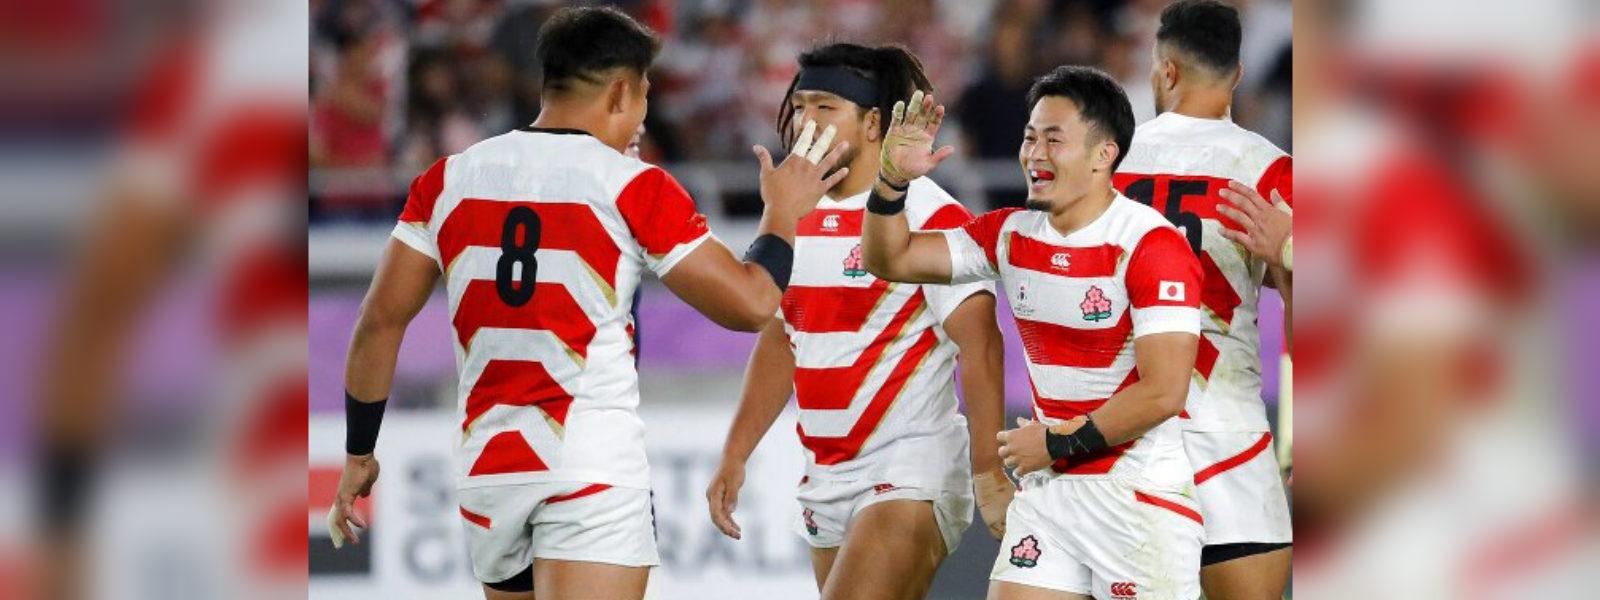 Japan beats Scotland and advances to RWC quarter finals